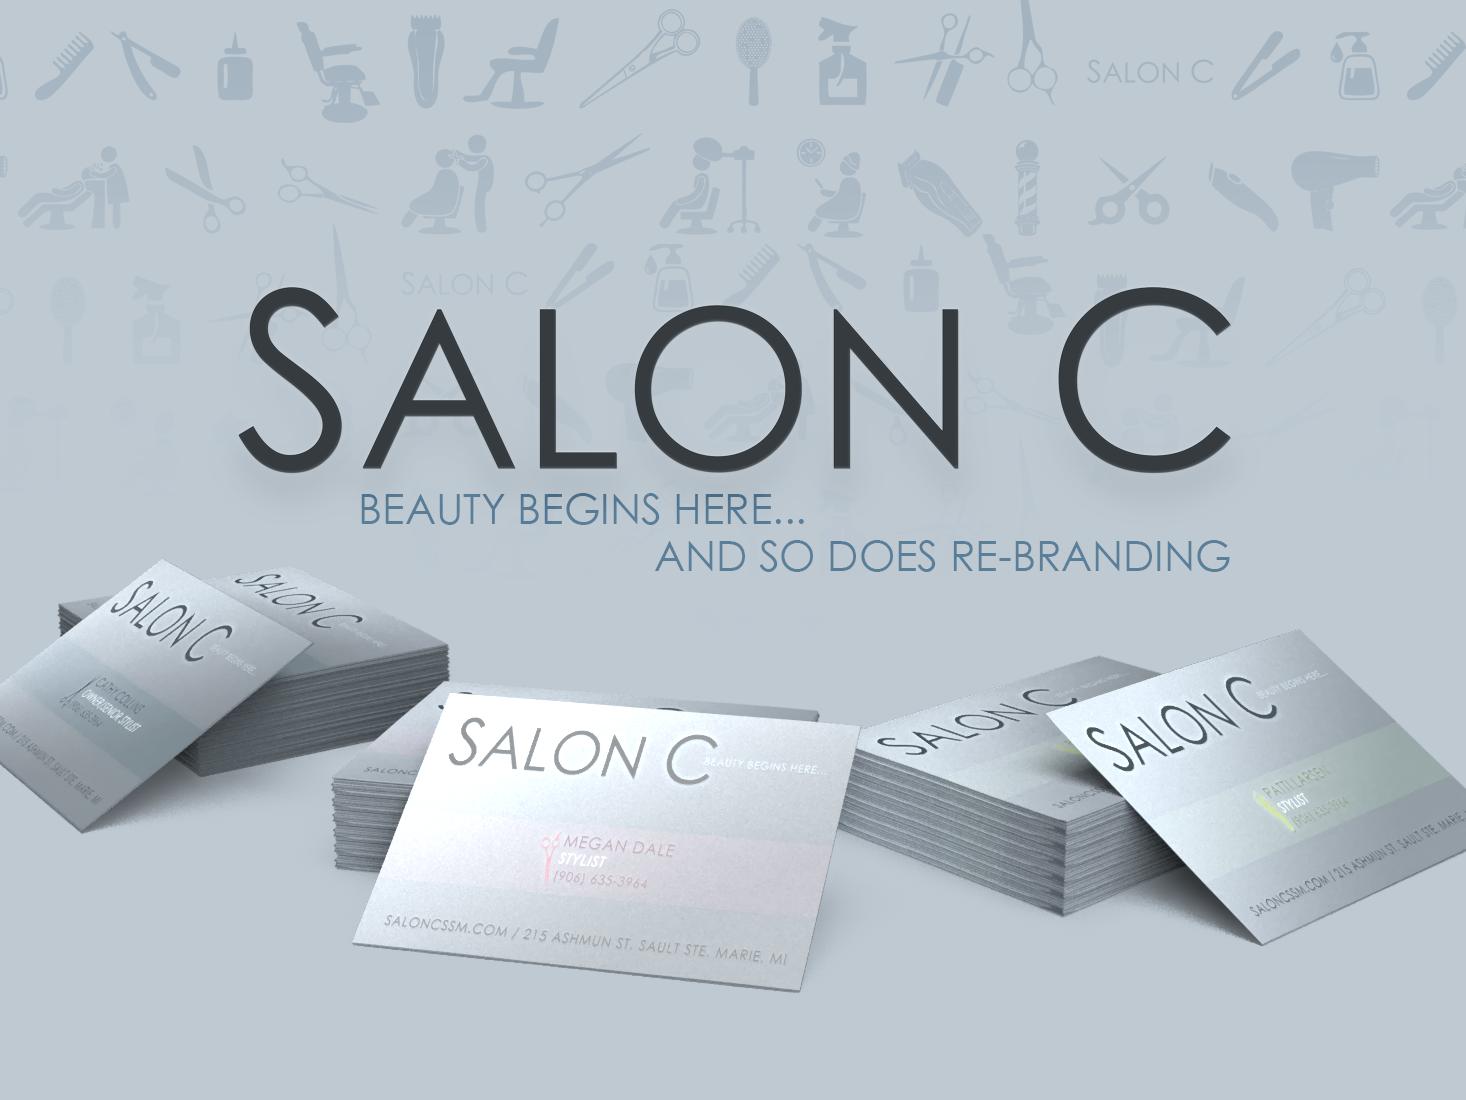 Salon C, Re-Branding cosmetology hair local salon c salon dimension logo vector digital photoshop illustration brand design brand identity brand re-brand re-branding rebranding branding